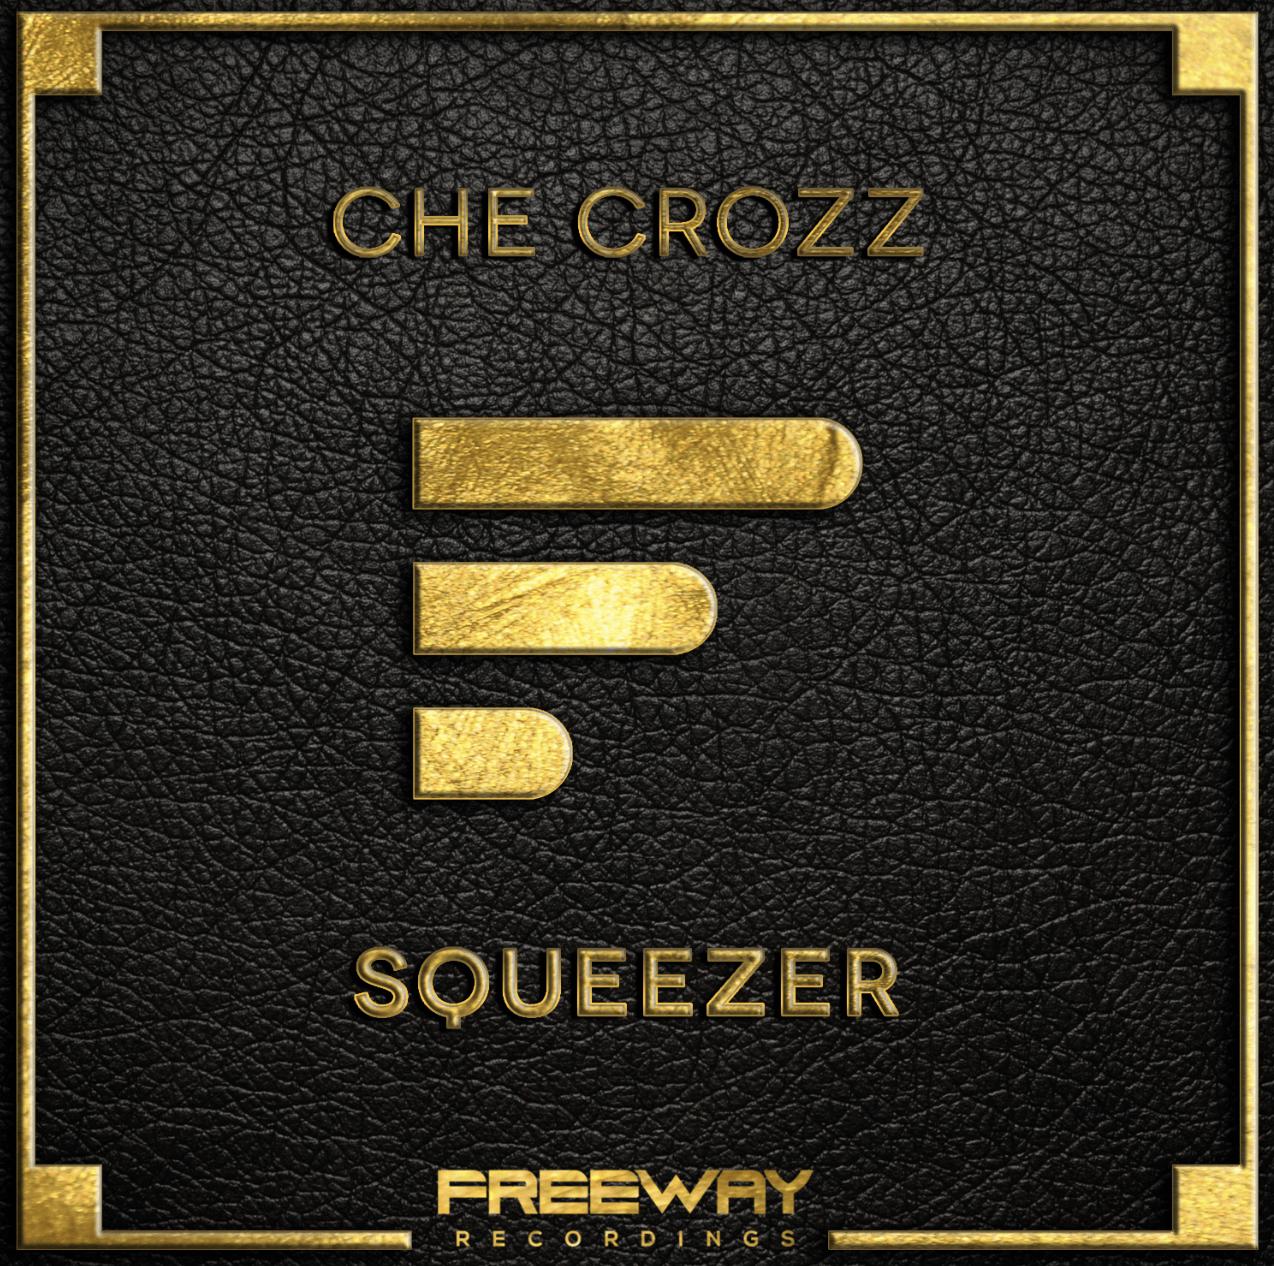 che_crozz_-_squeezer_freeway_recordings.png